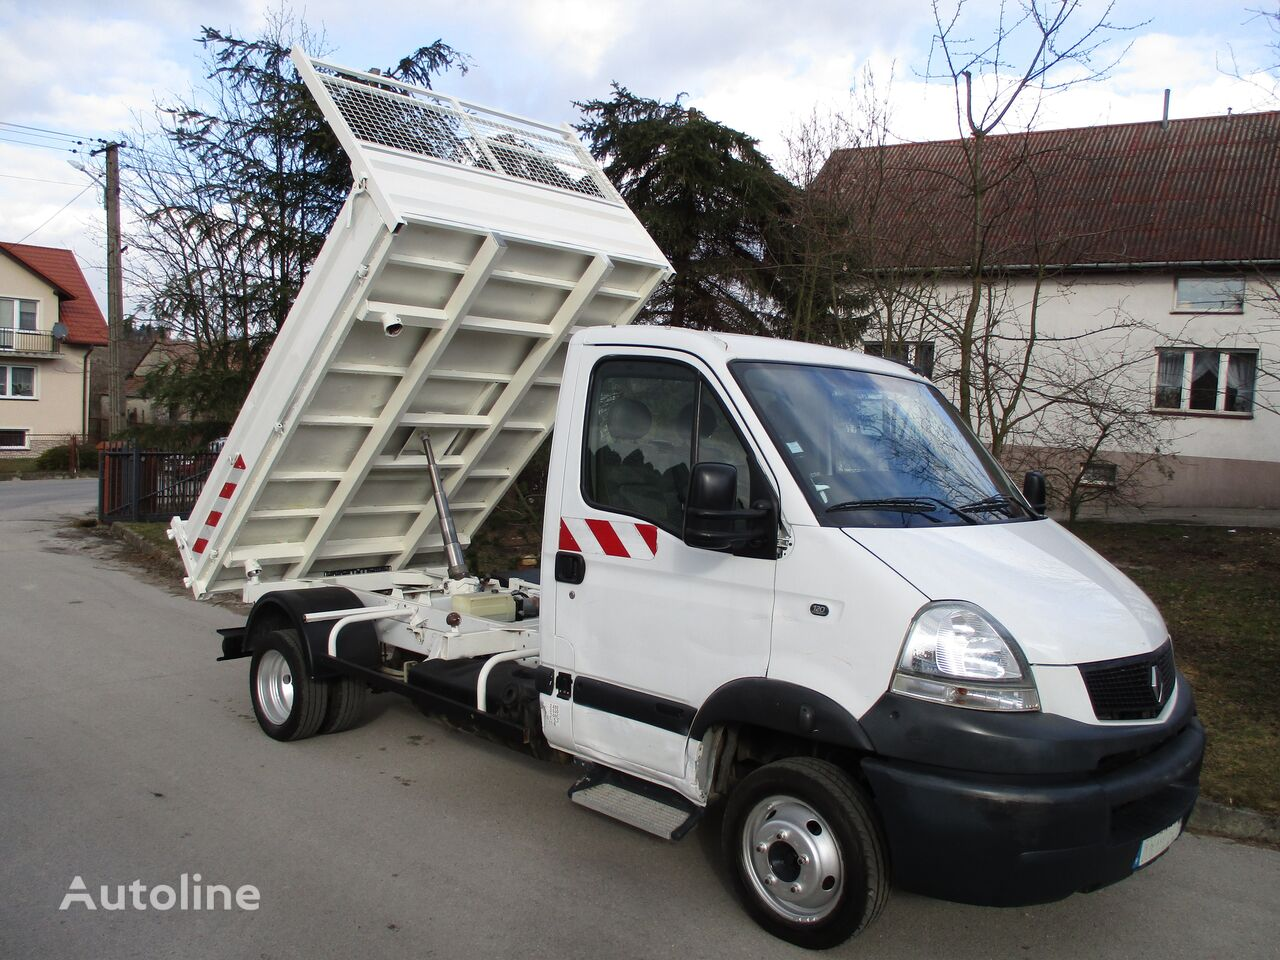 RENAULT  Renault Mascott 3.0Dxi -120 KM Kiper 3-stronny Wywrotka HAK  dump truck < 3.5t